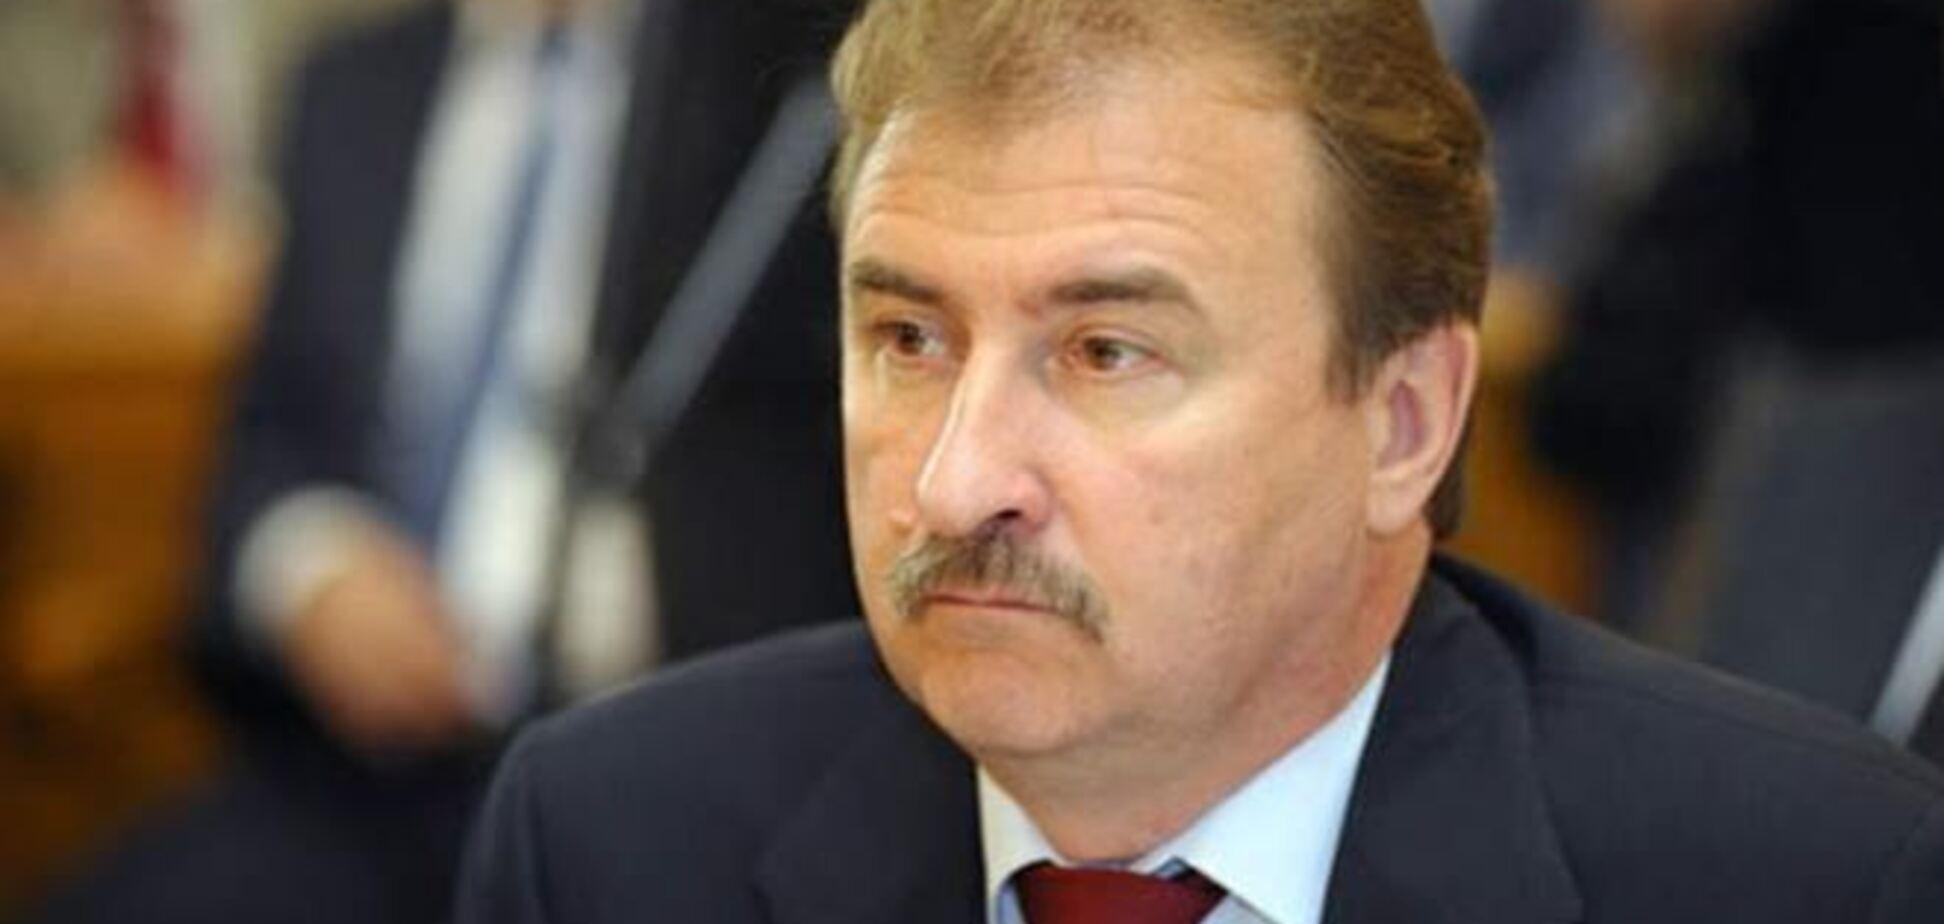 Жертв на Майдане подбирали спецслужбы - экс-глава КГГА Попов